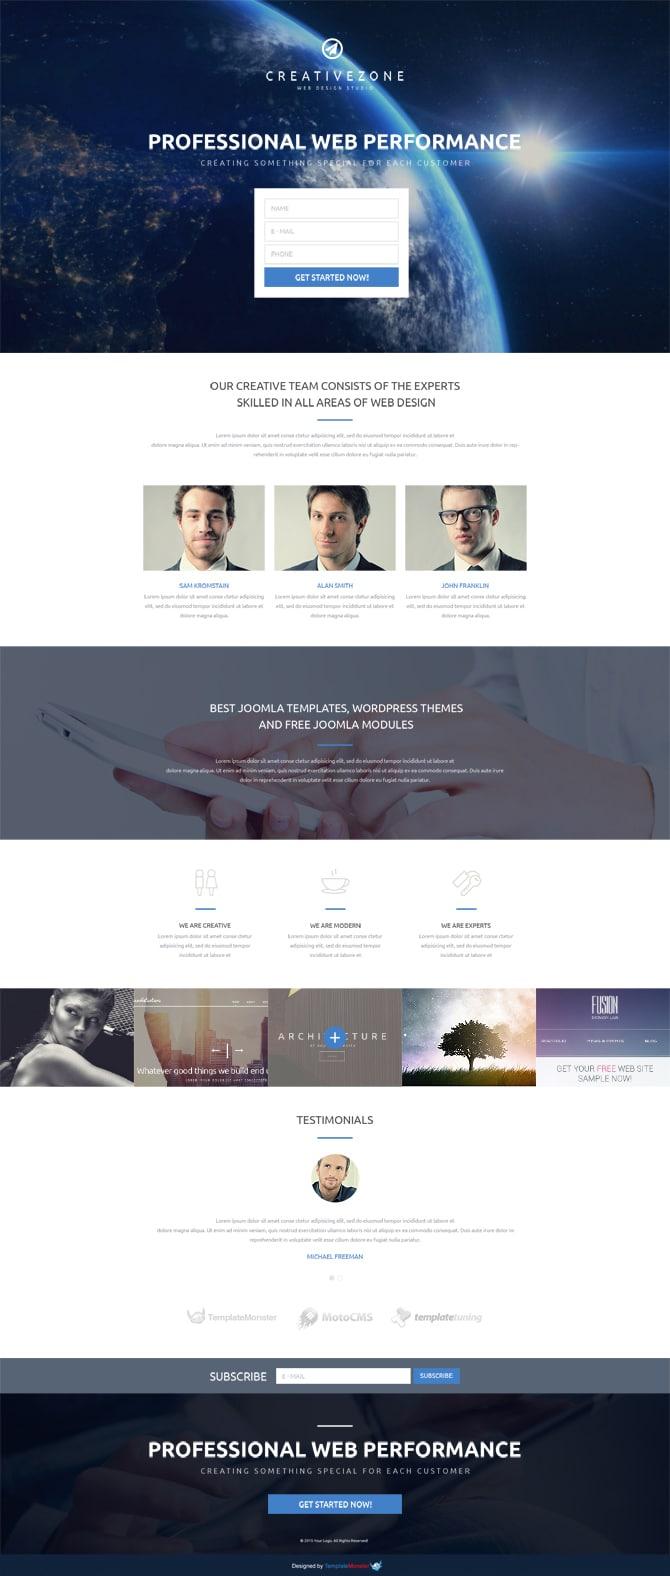 Design-Studio-Free-Landing-Page-Template-PSD